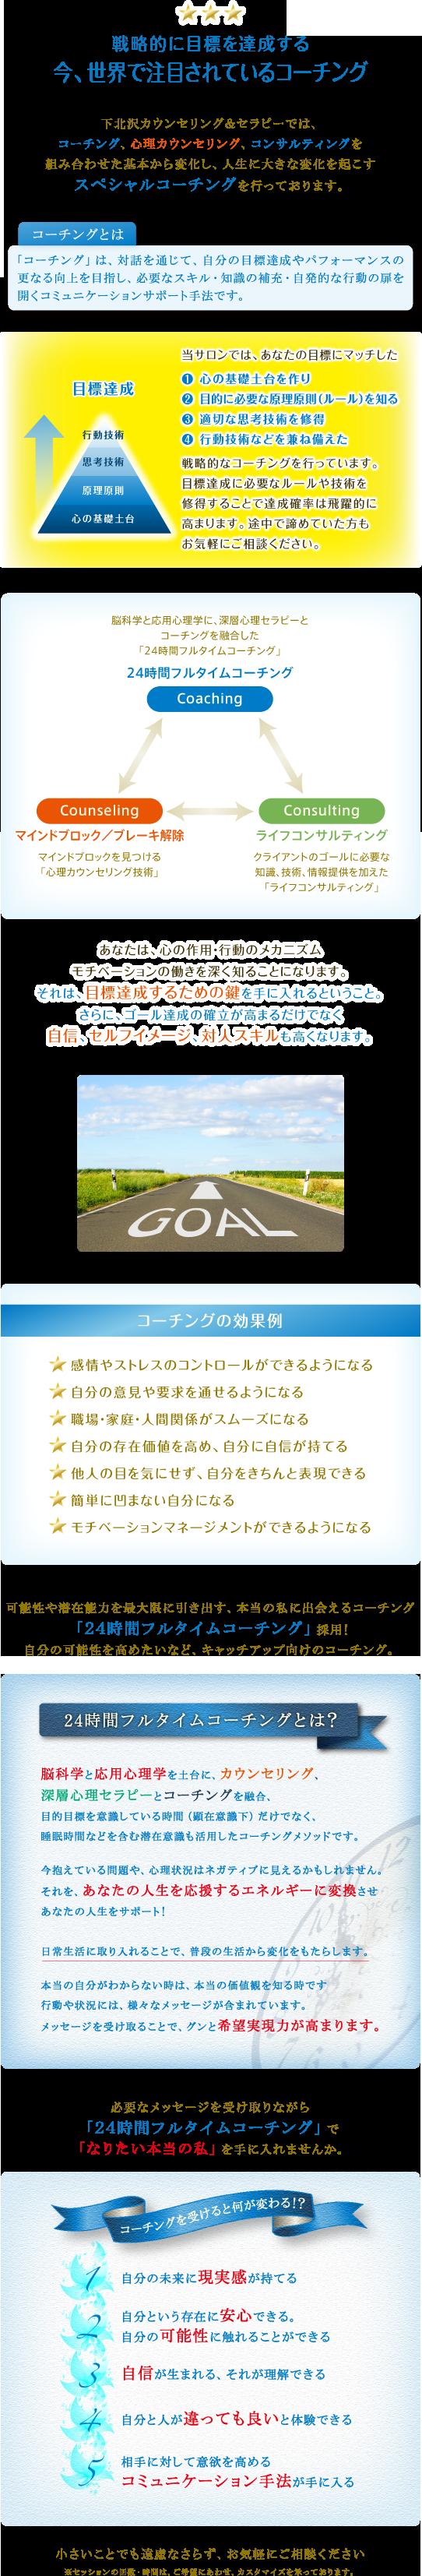 tokyo_setagaya_shimokitszawa_counseling_therapy_coaching256